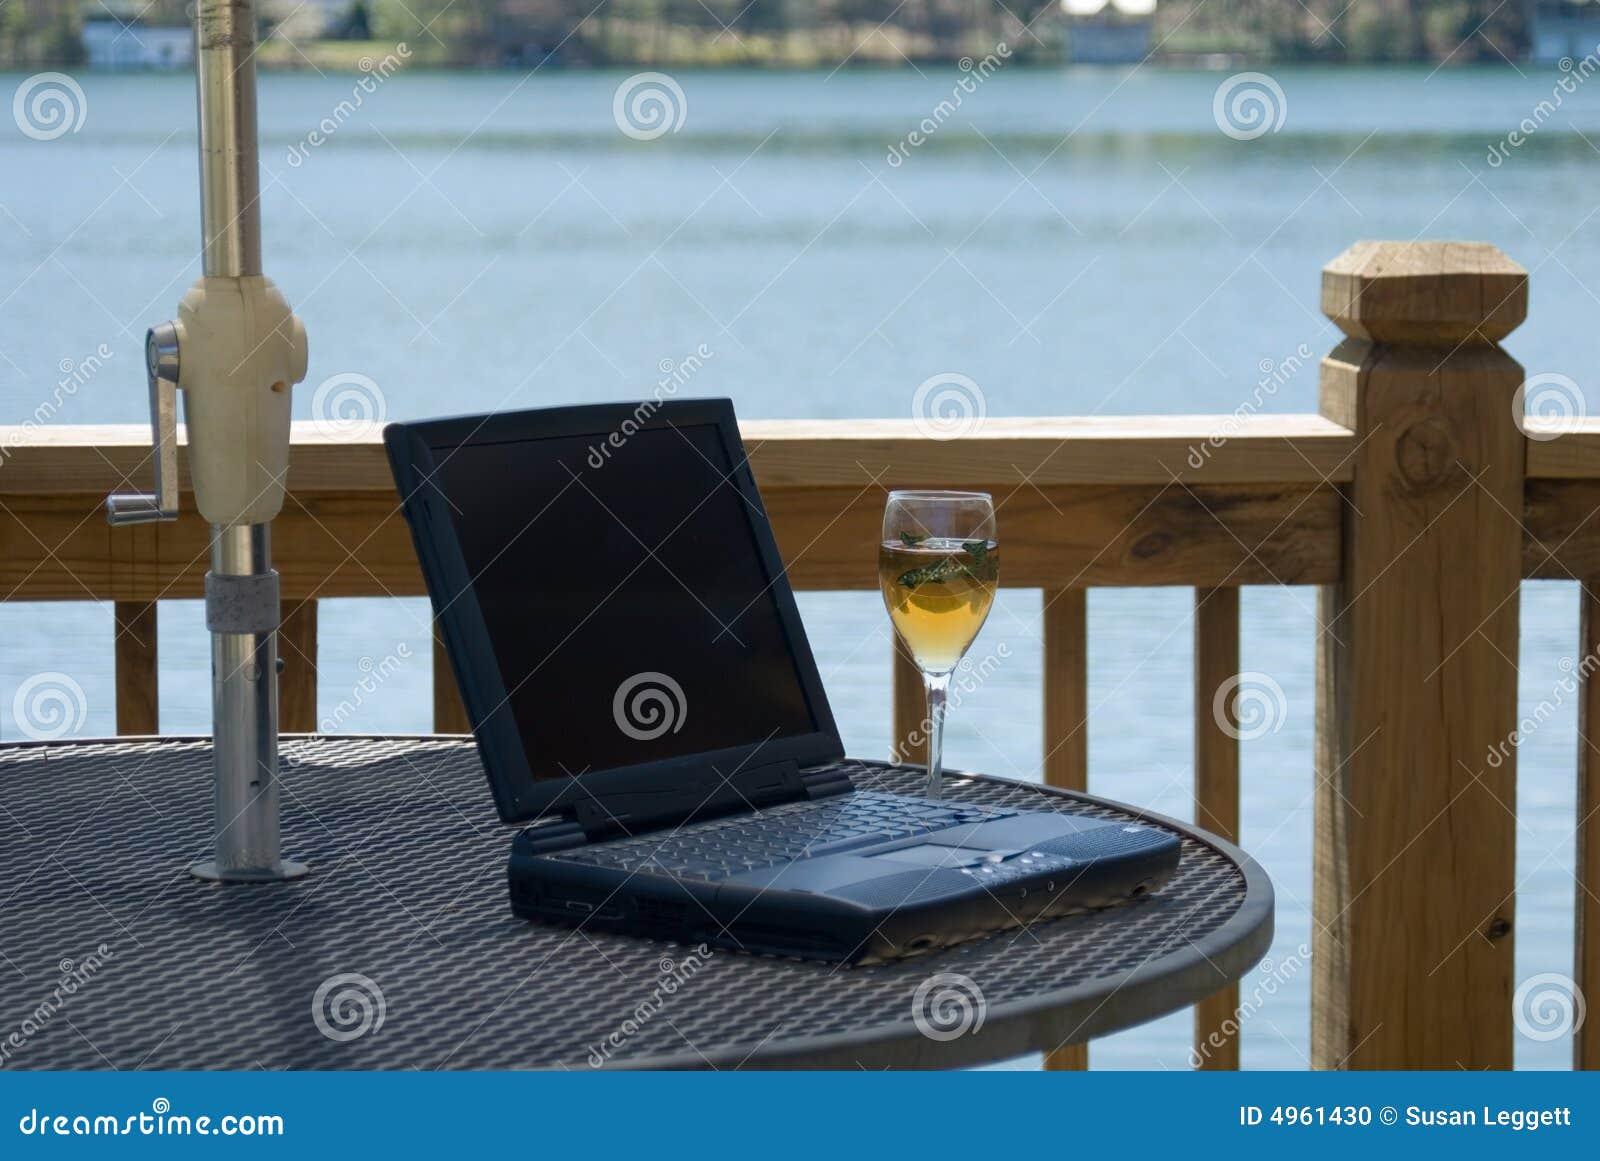 Computer and wine